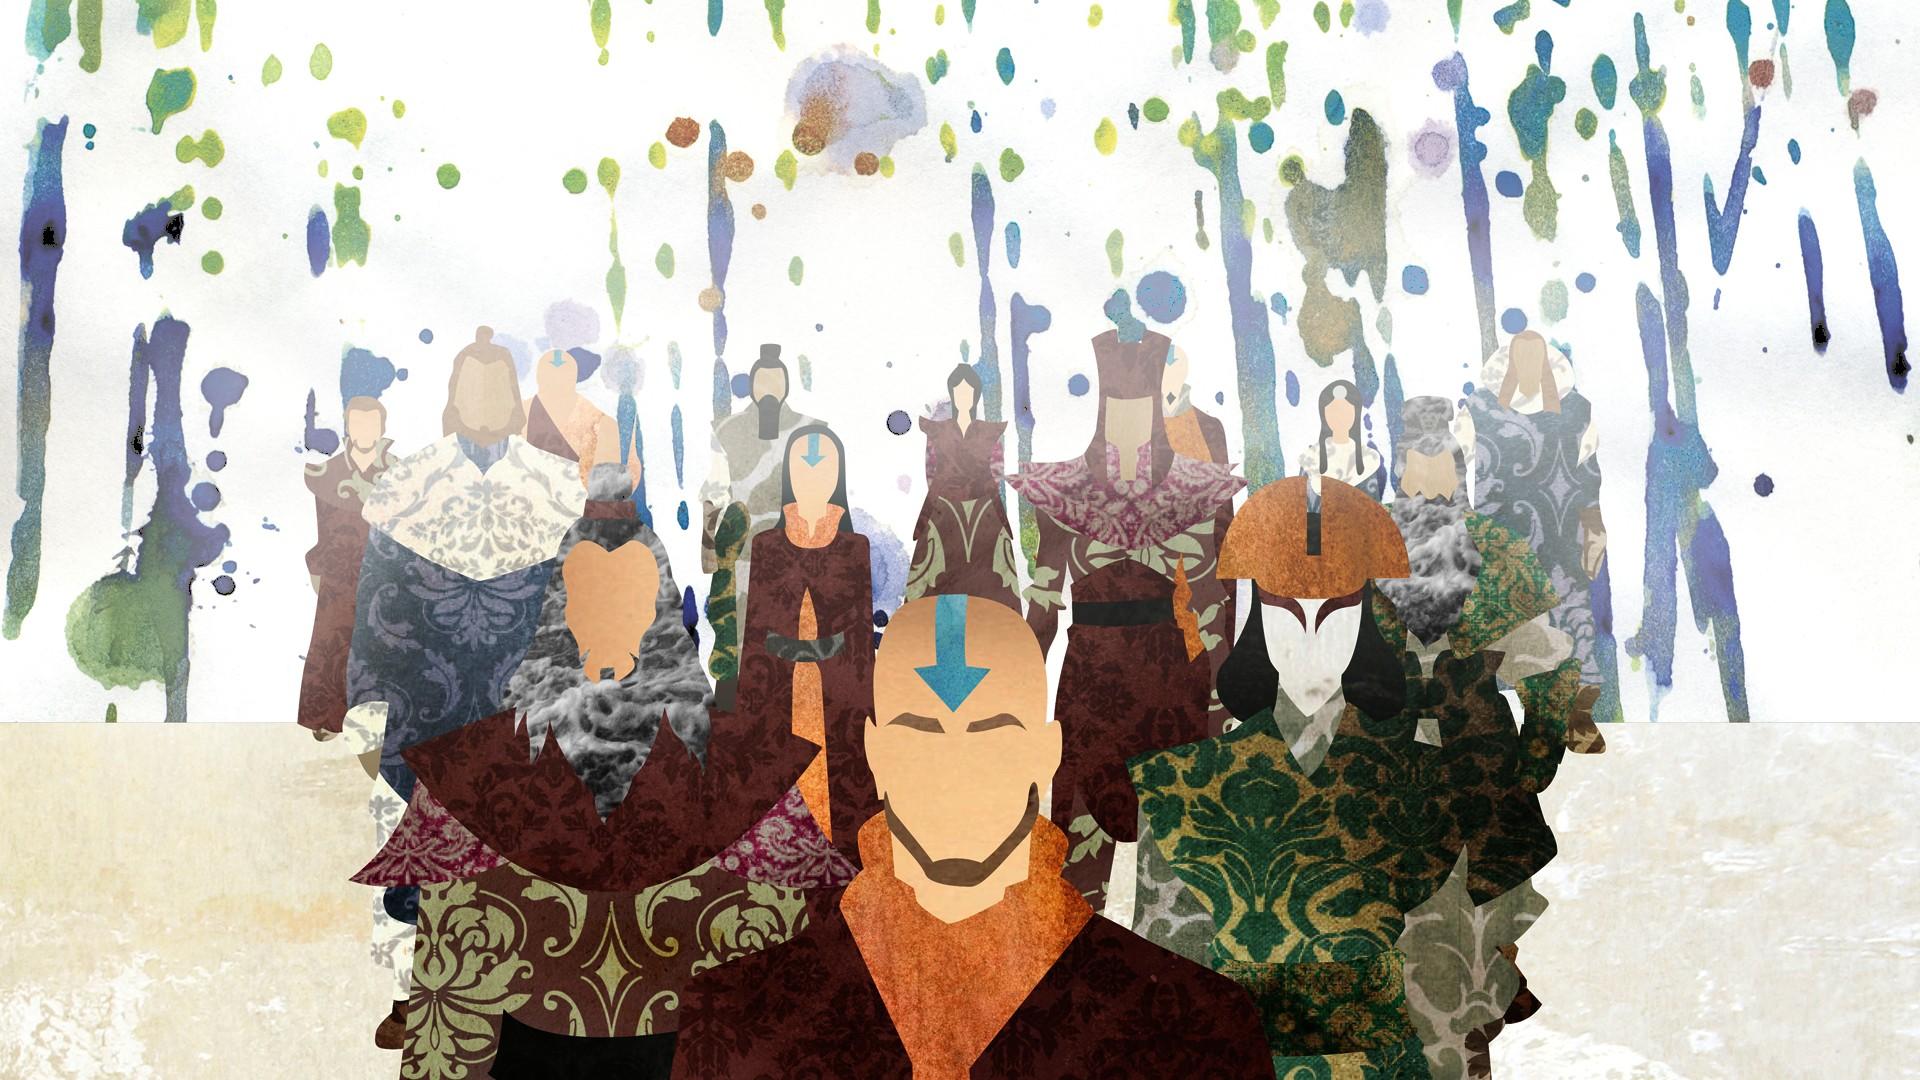 Avatar The Last Airbender Wallpaper Download Free Stunning